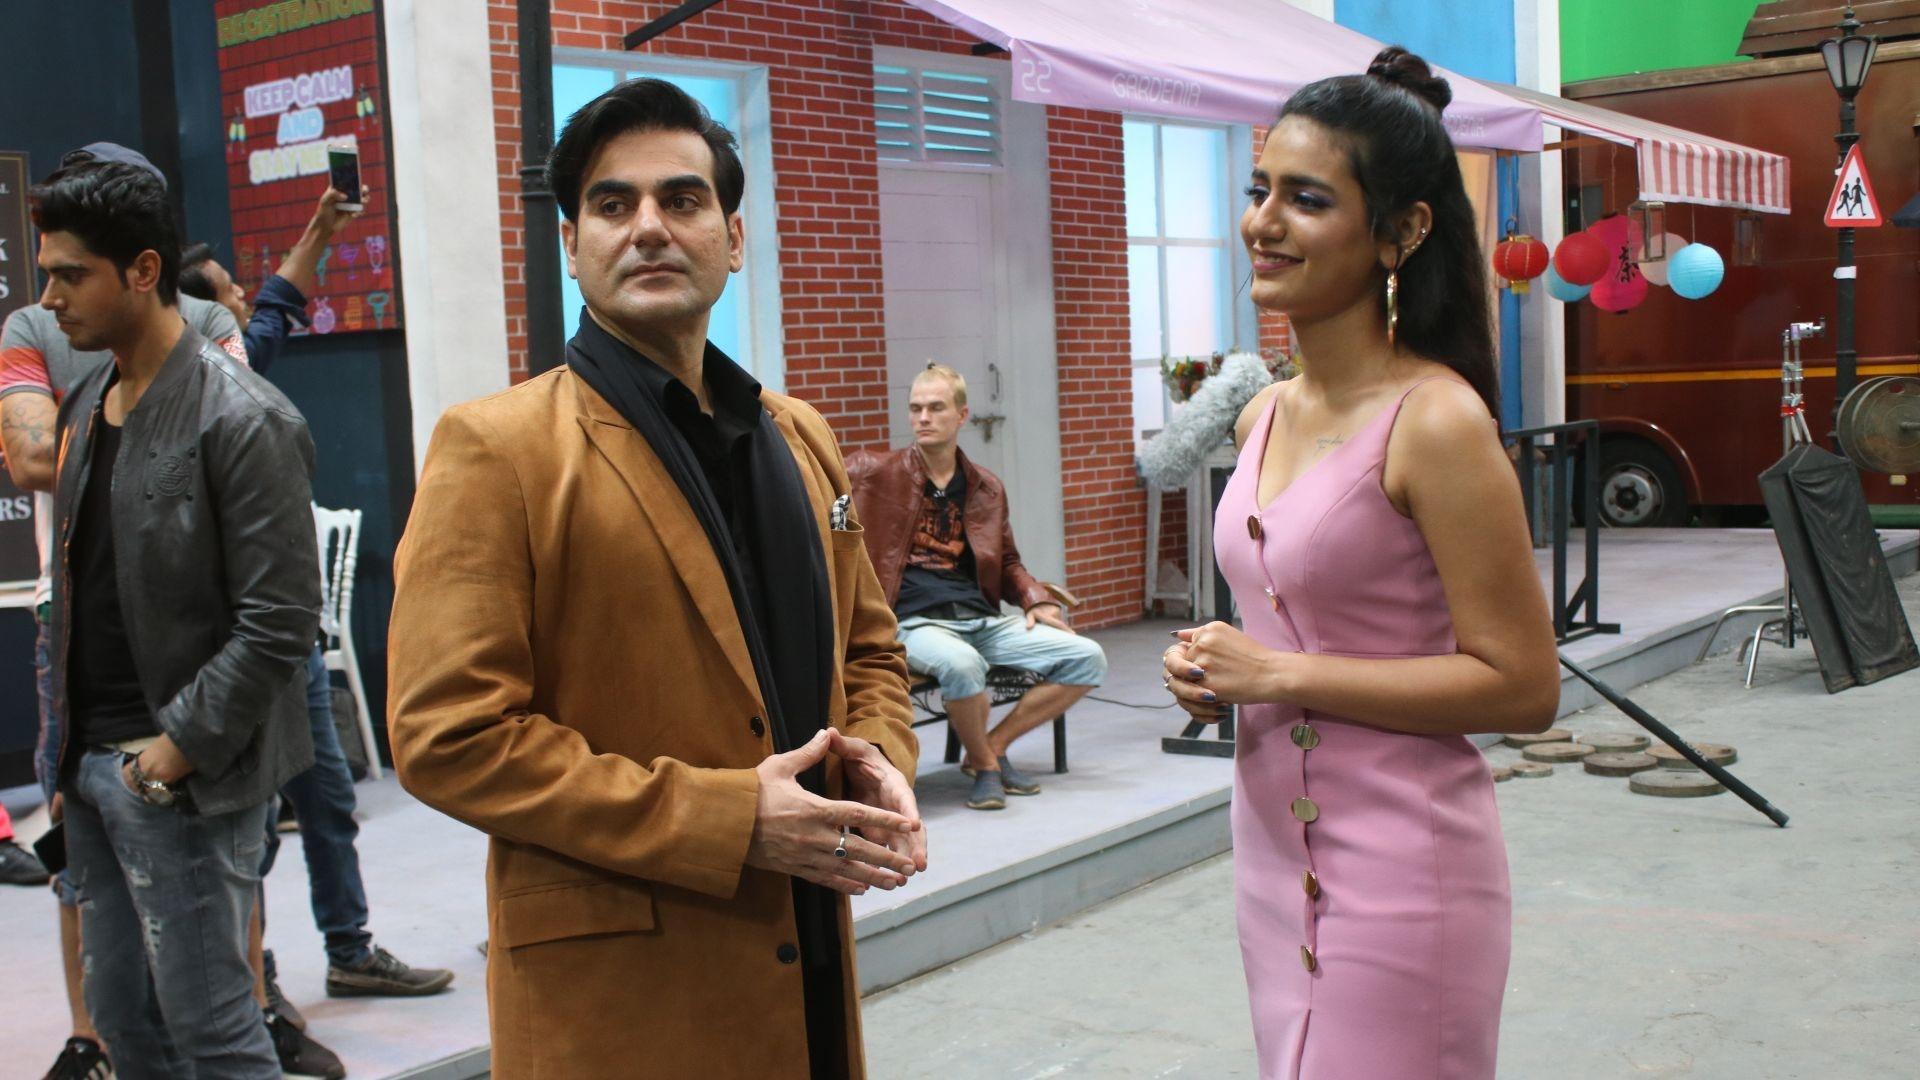 Priya Prakash Varrier and Arbaaz Khan Shoot for 'Sridevi Bungalow' - The Quint